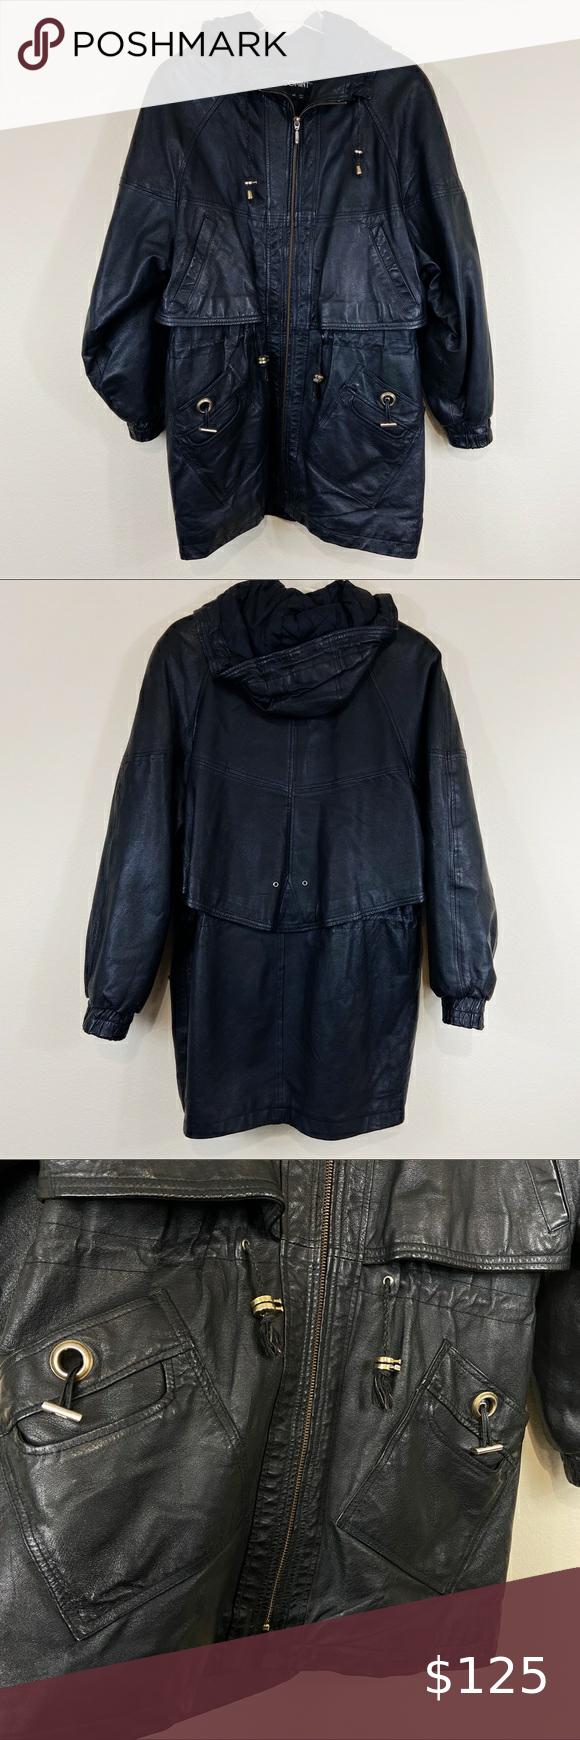 1980 S Vintage Comint Leather Jacket Sz M Circa 1980 S Vintage Comint Brand Black Leather Jacket Size M Wool Maxi Coat Long Leather Coat Black Leather Skirts [ 1740 x 580 Pixel ]